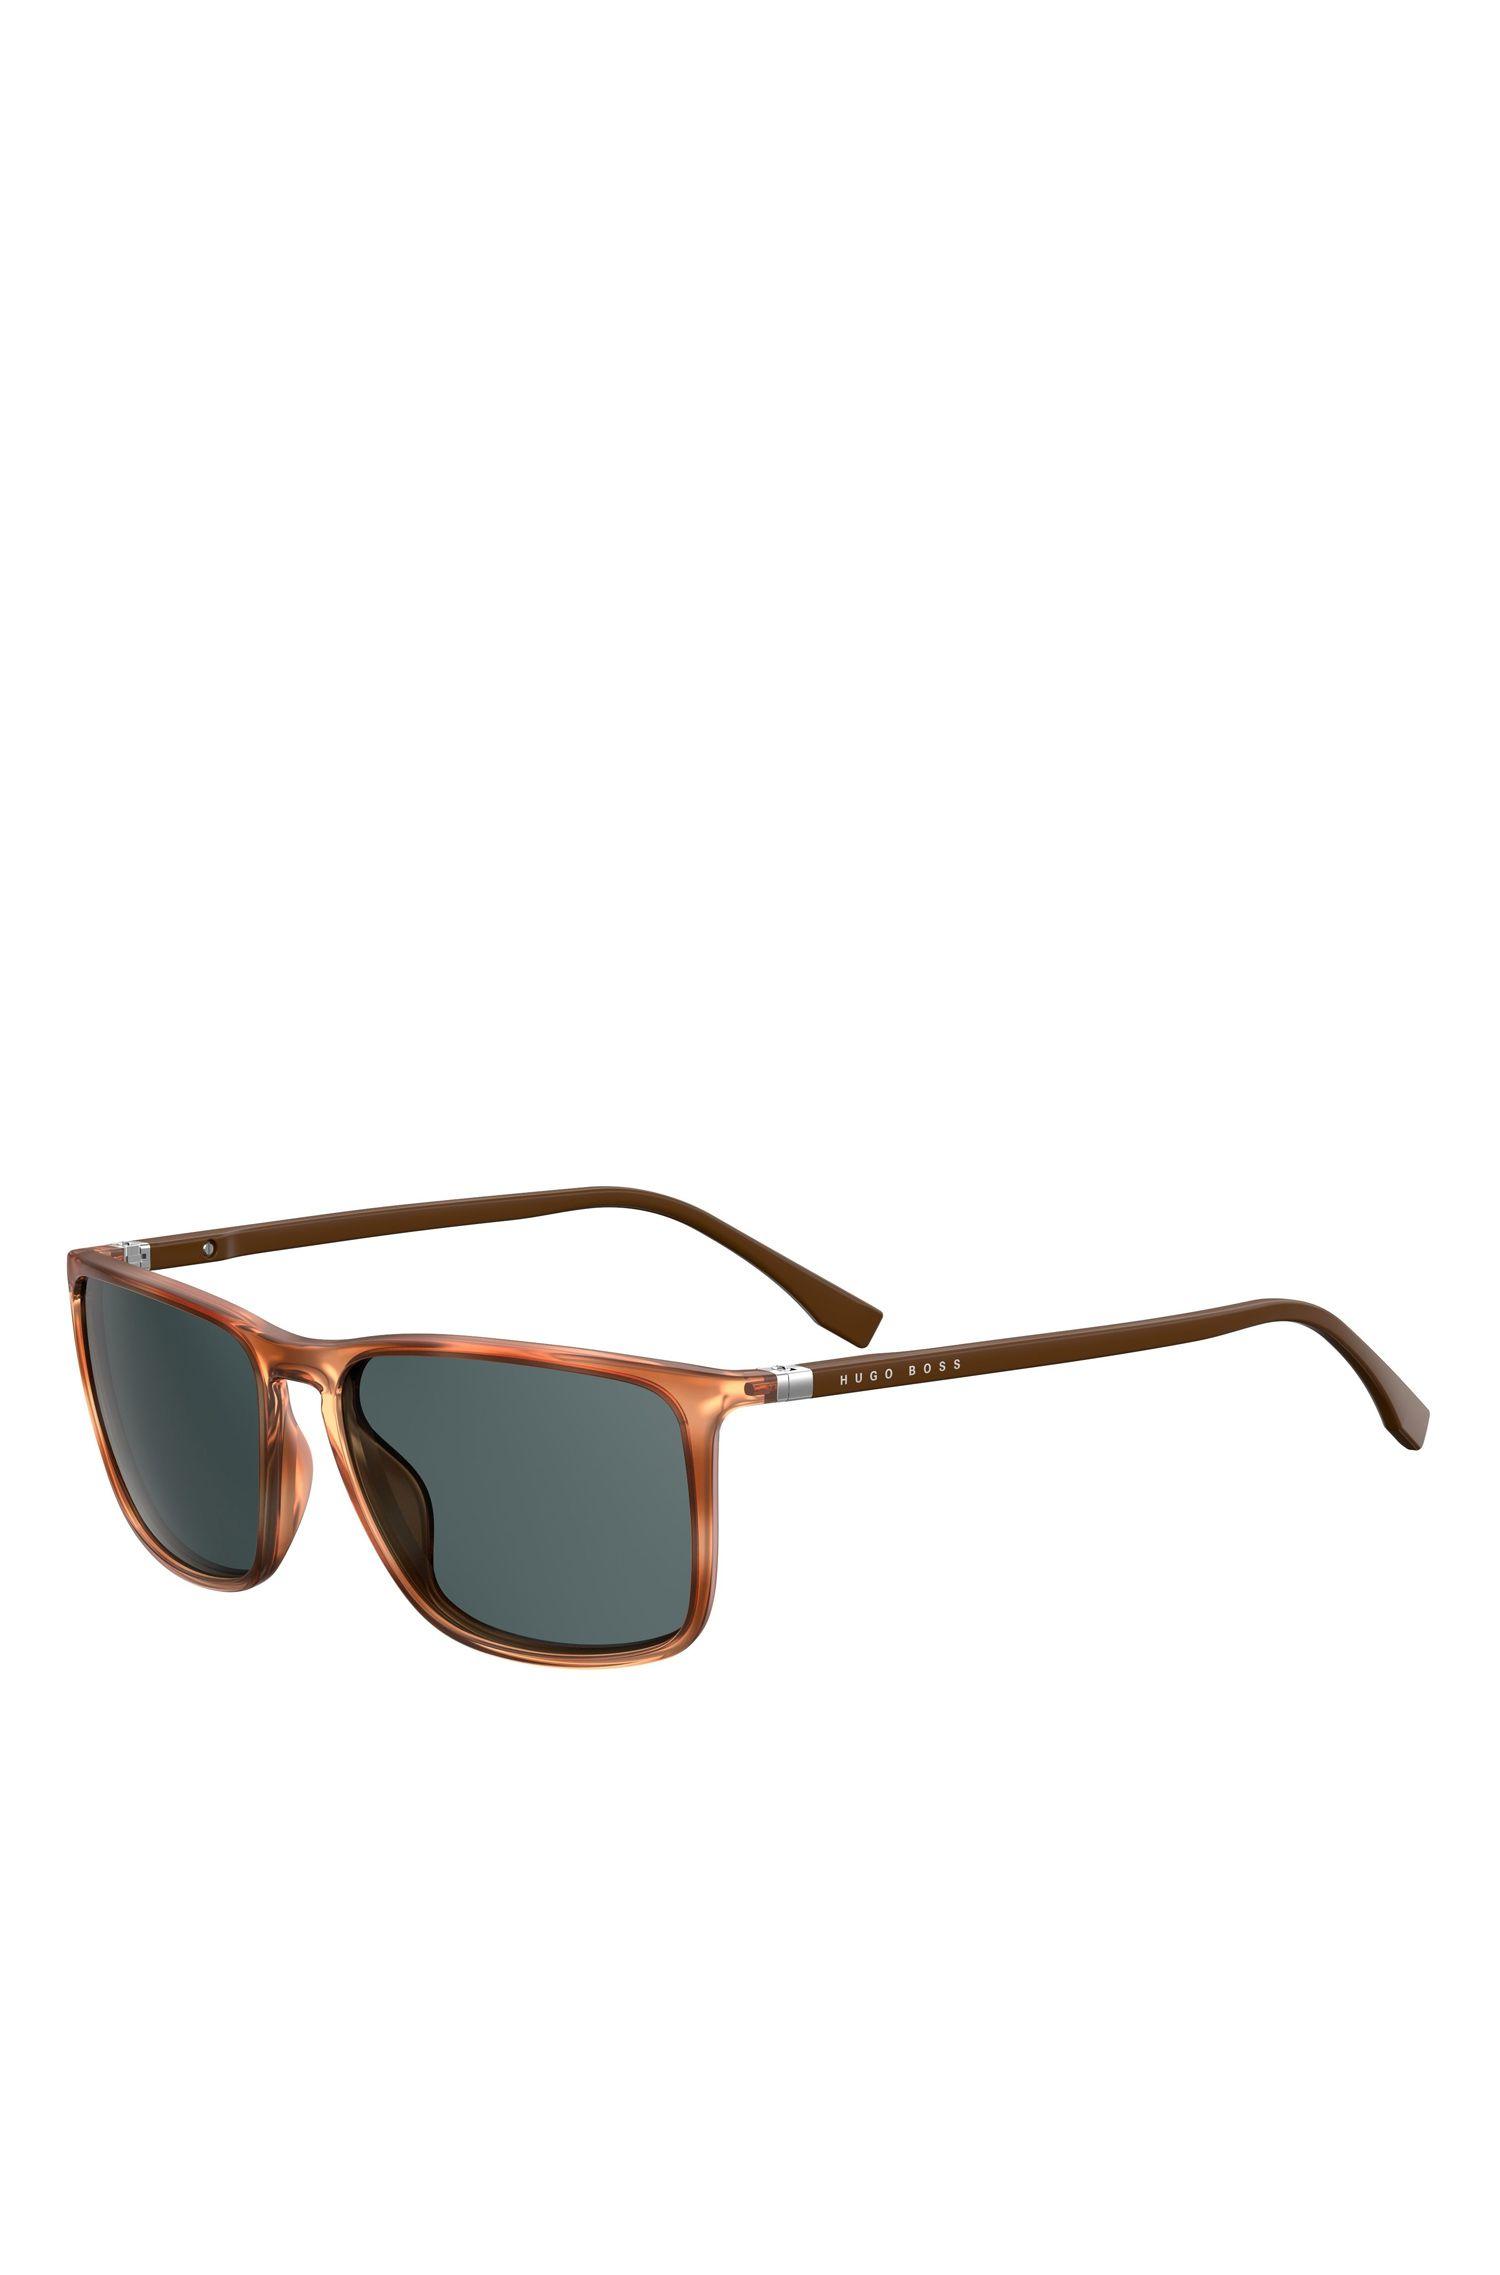 'BOSS 0665S' | Grey Lens Rectangular Sunglasses